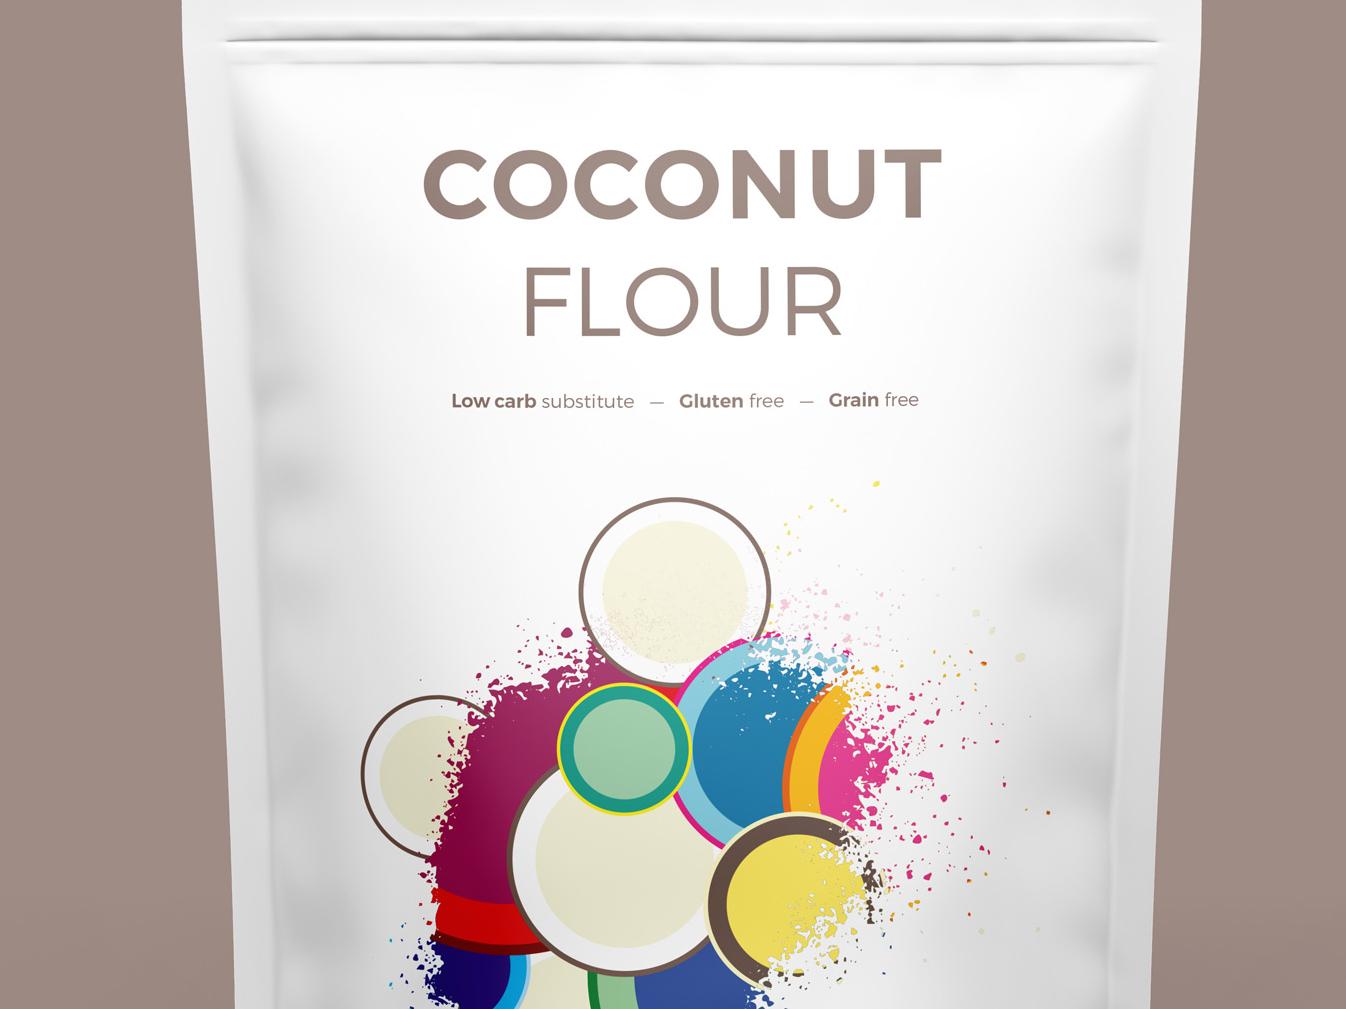 Coconutflourv1.0